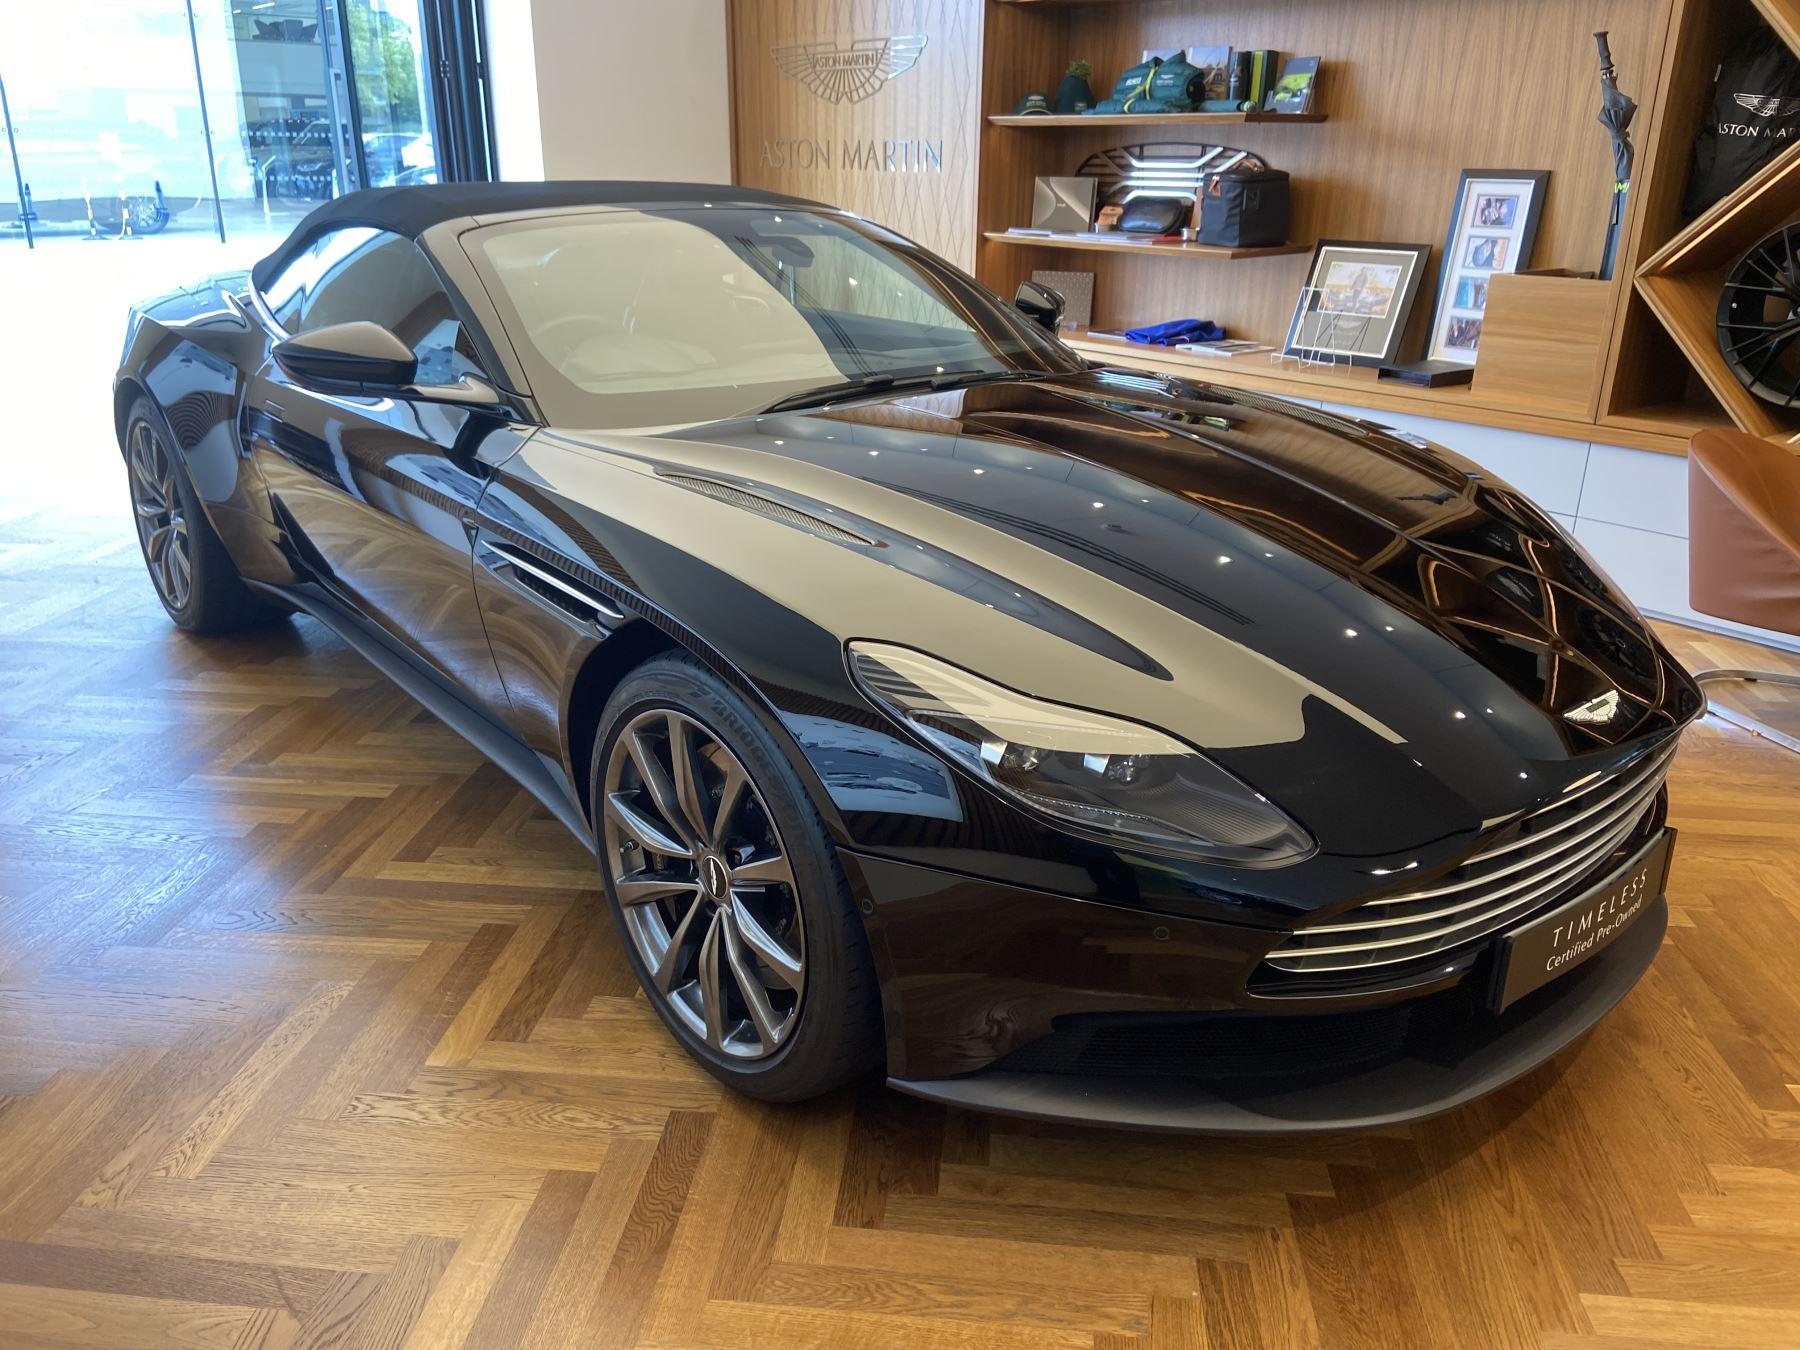 Aston Martin DB11 Volante V8 Volante Touchtronic image 2